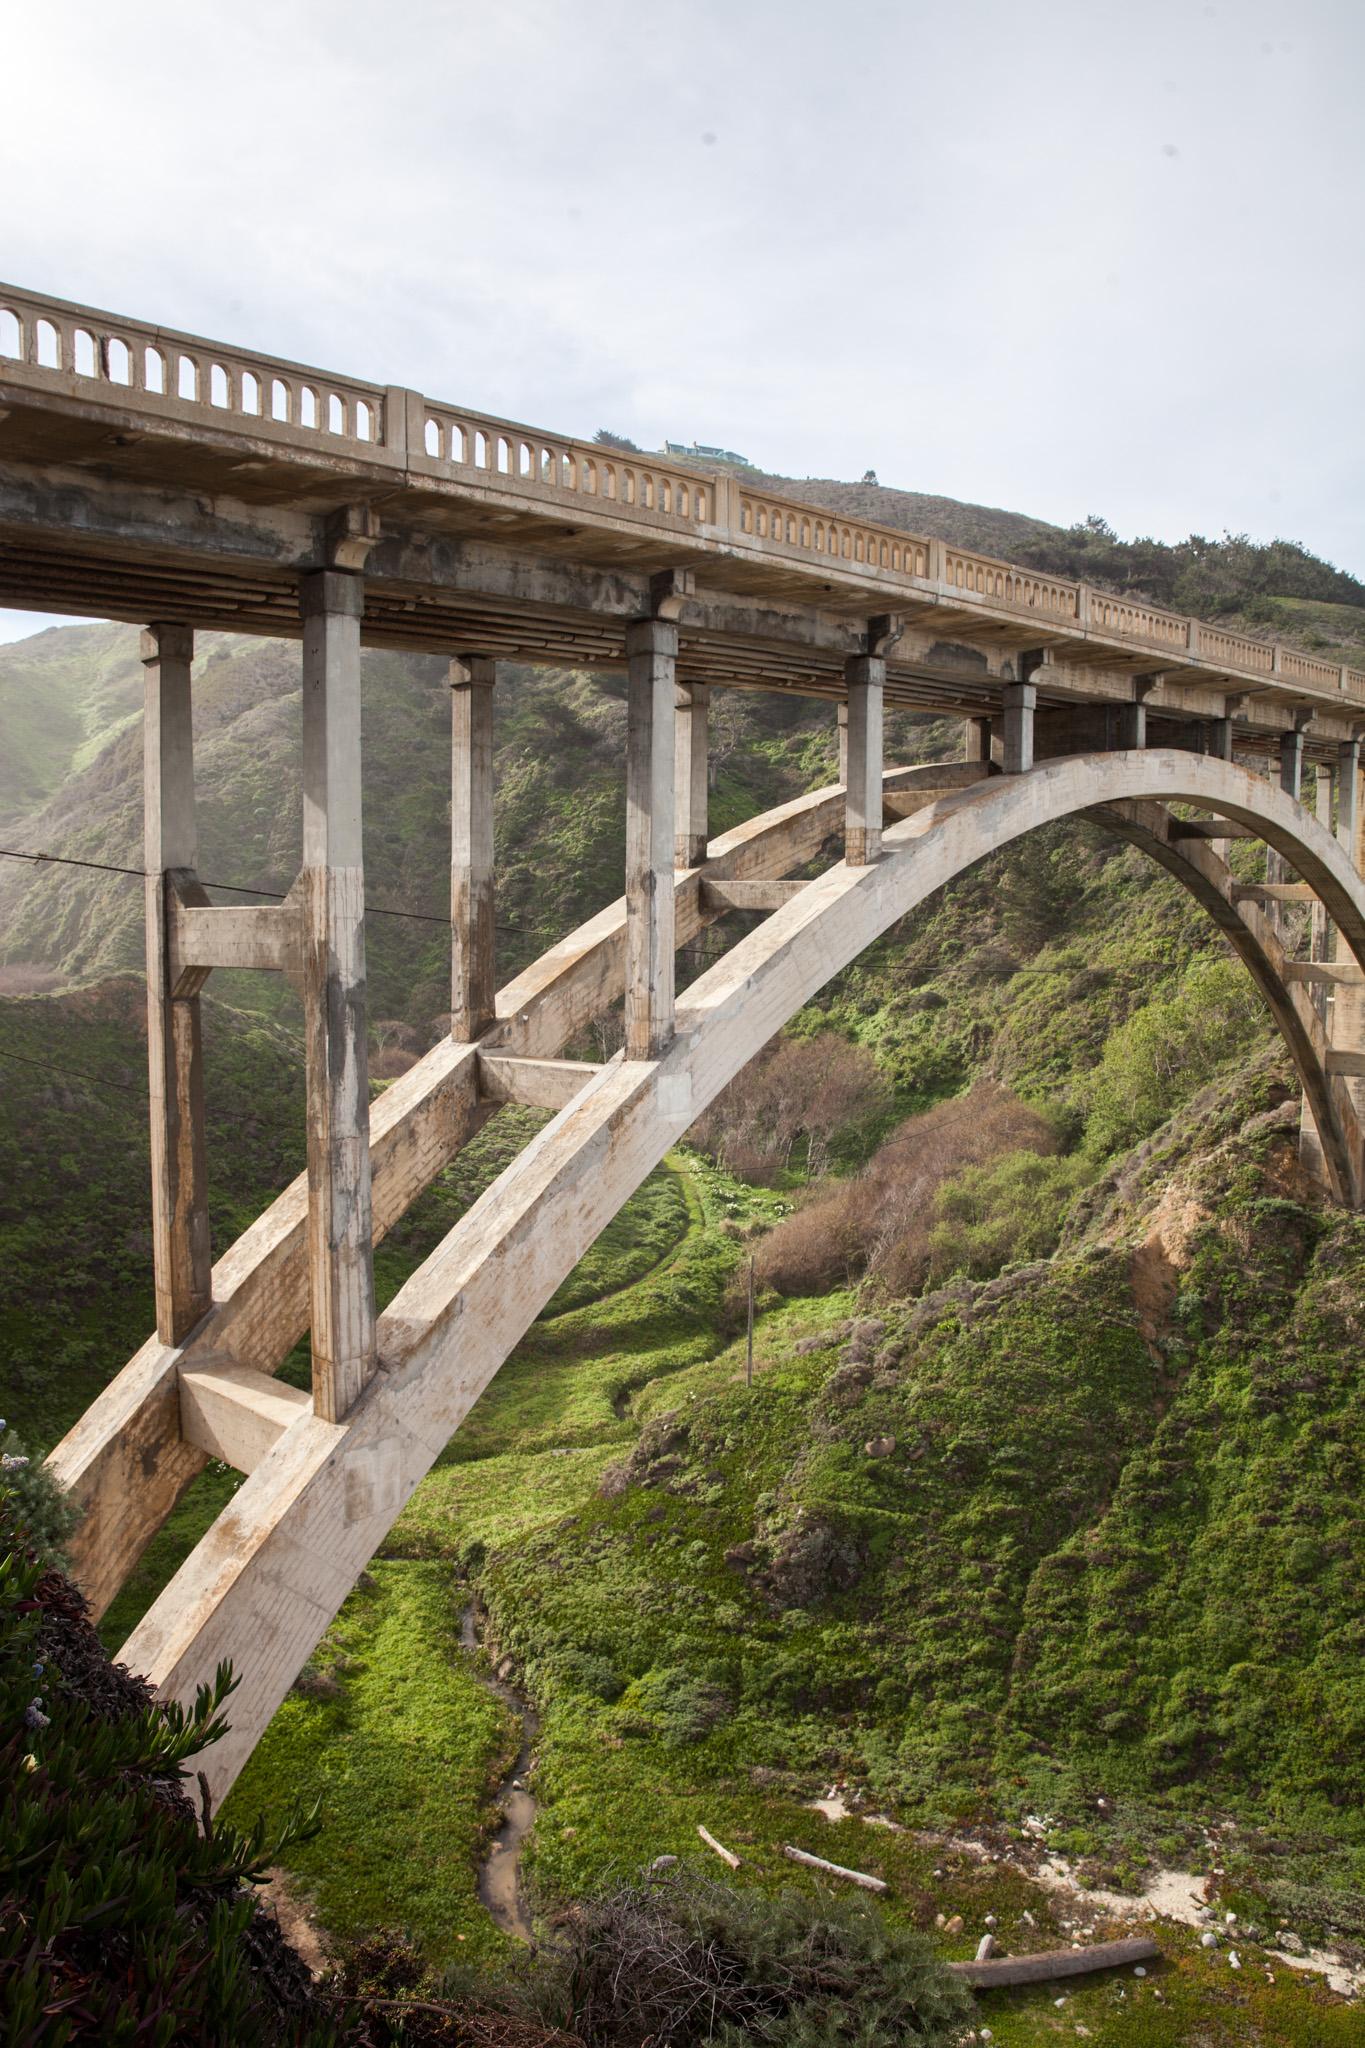 Bixby Creek Bridge, by Virginia Mae Rollison